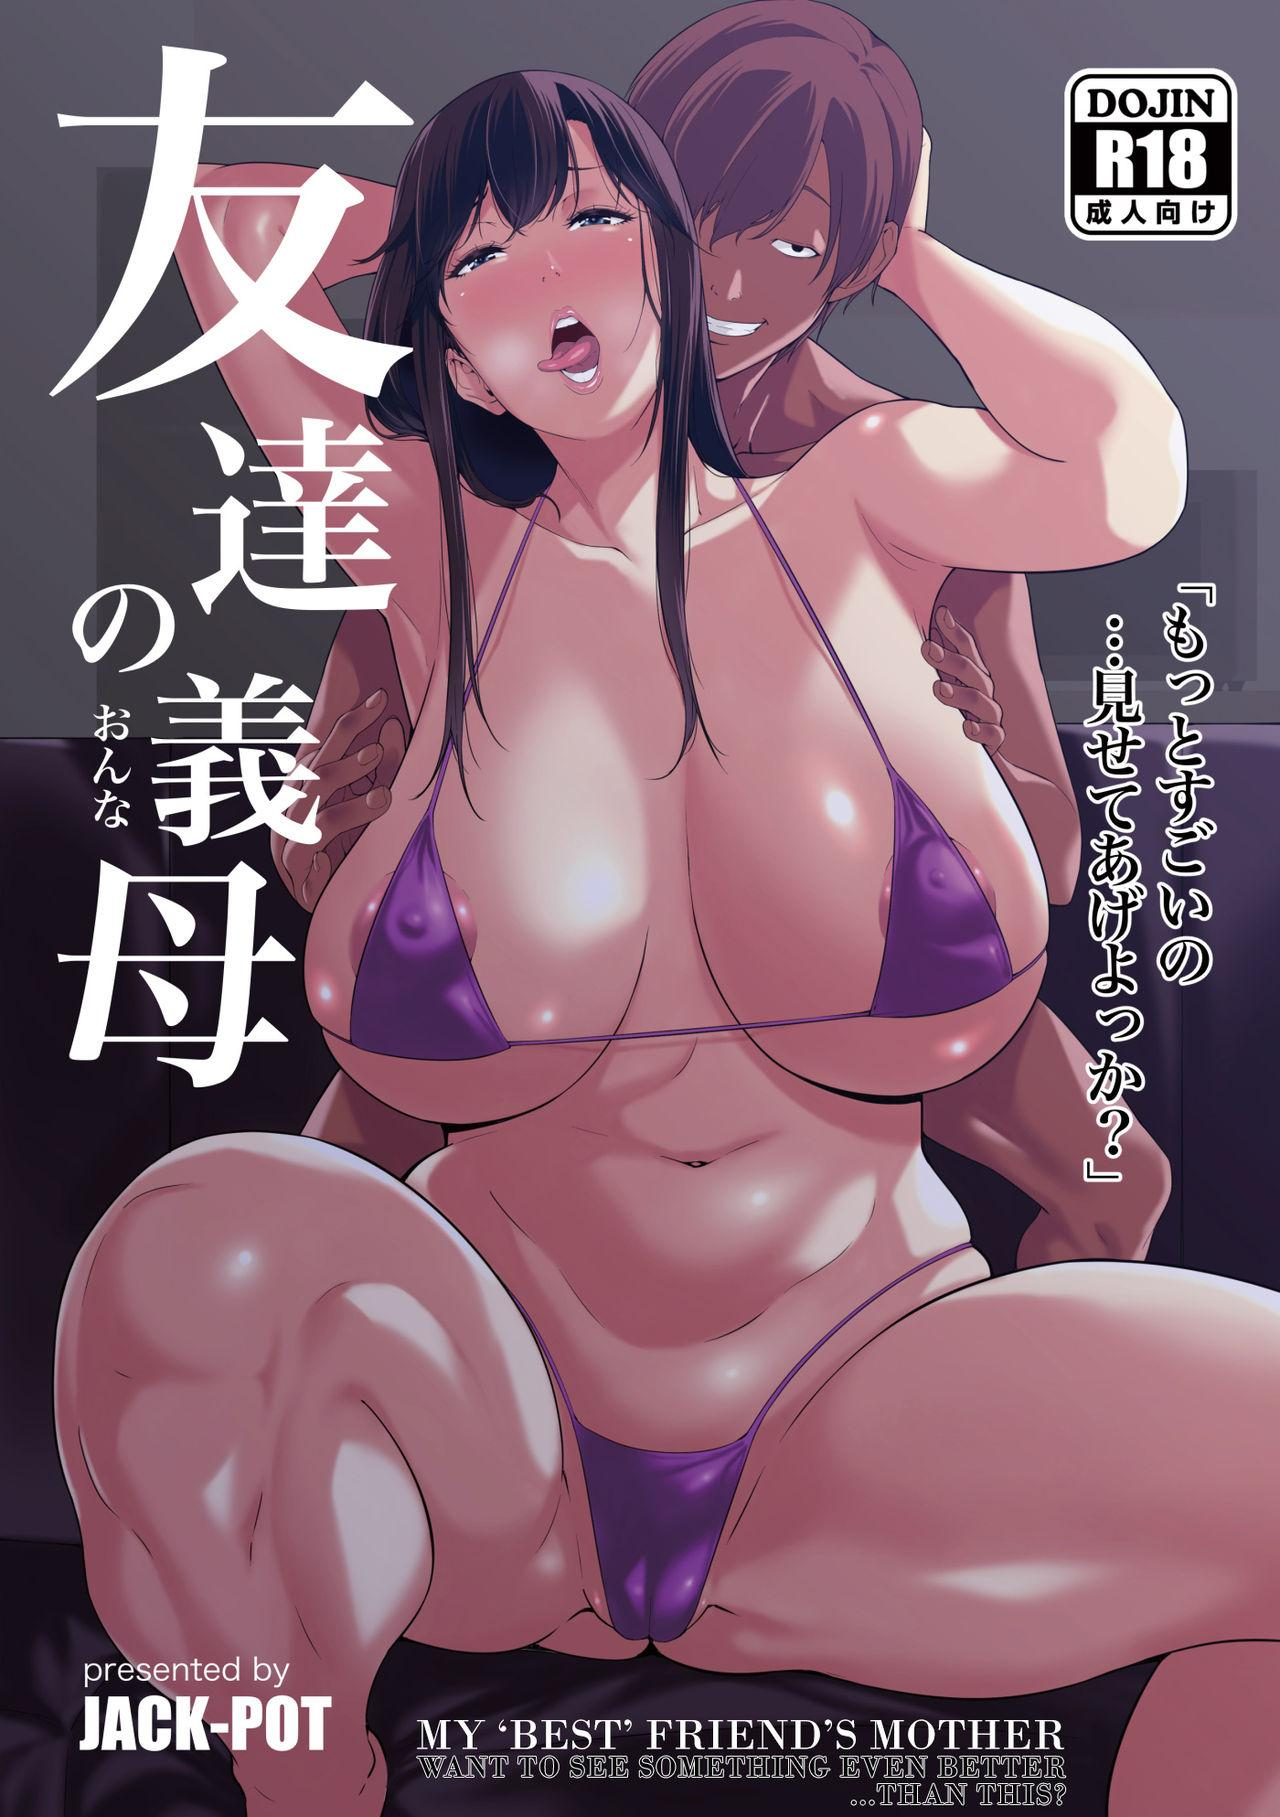 Tomodachi no Onna | My 'Best' Friend's Mother 0